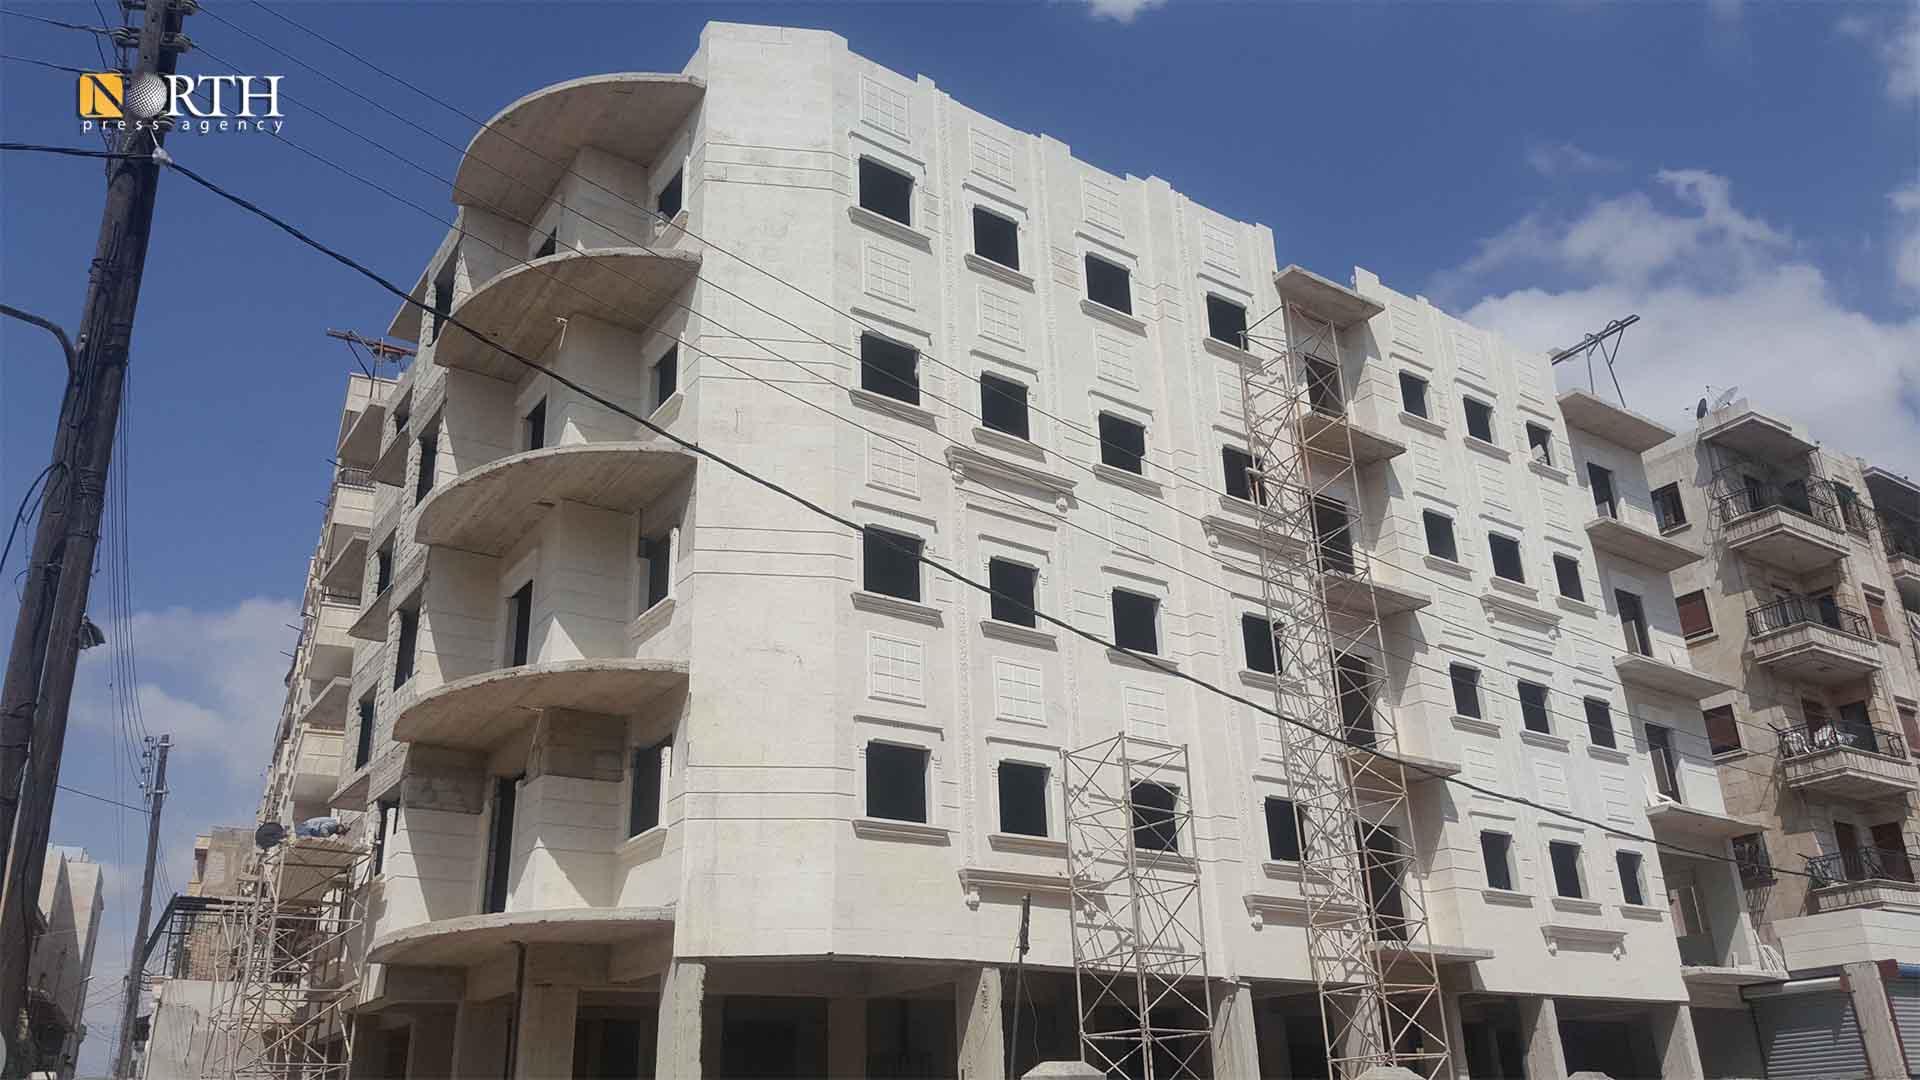 A building under construction in al-Zebdiya neighborhood in the city of Aleppo – North Press